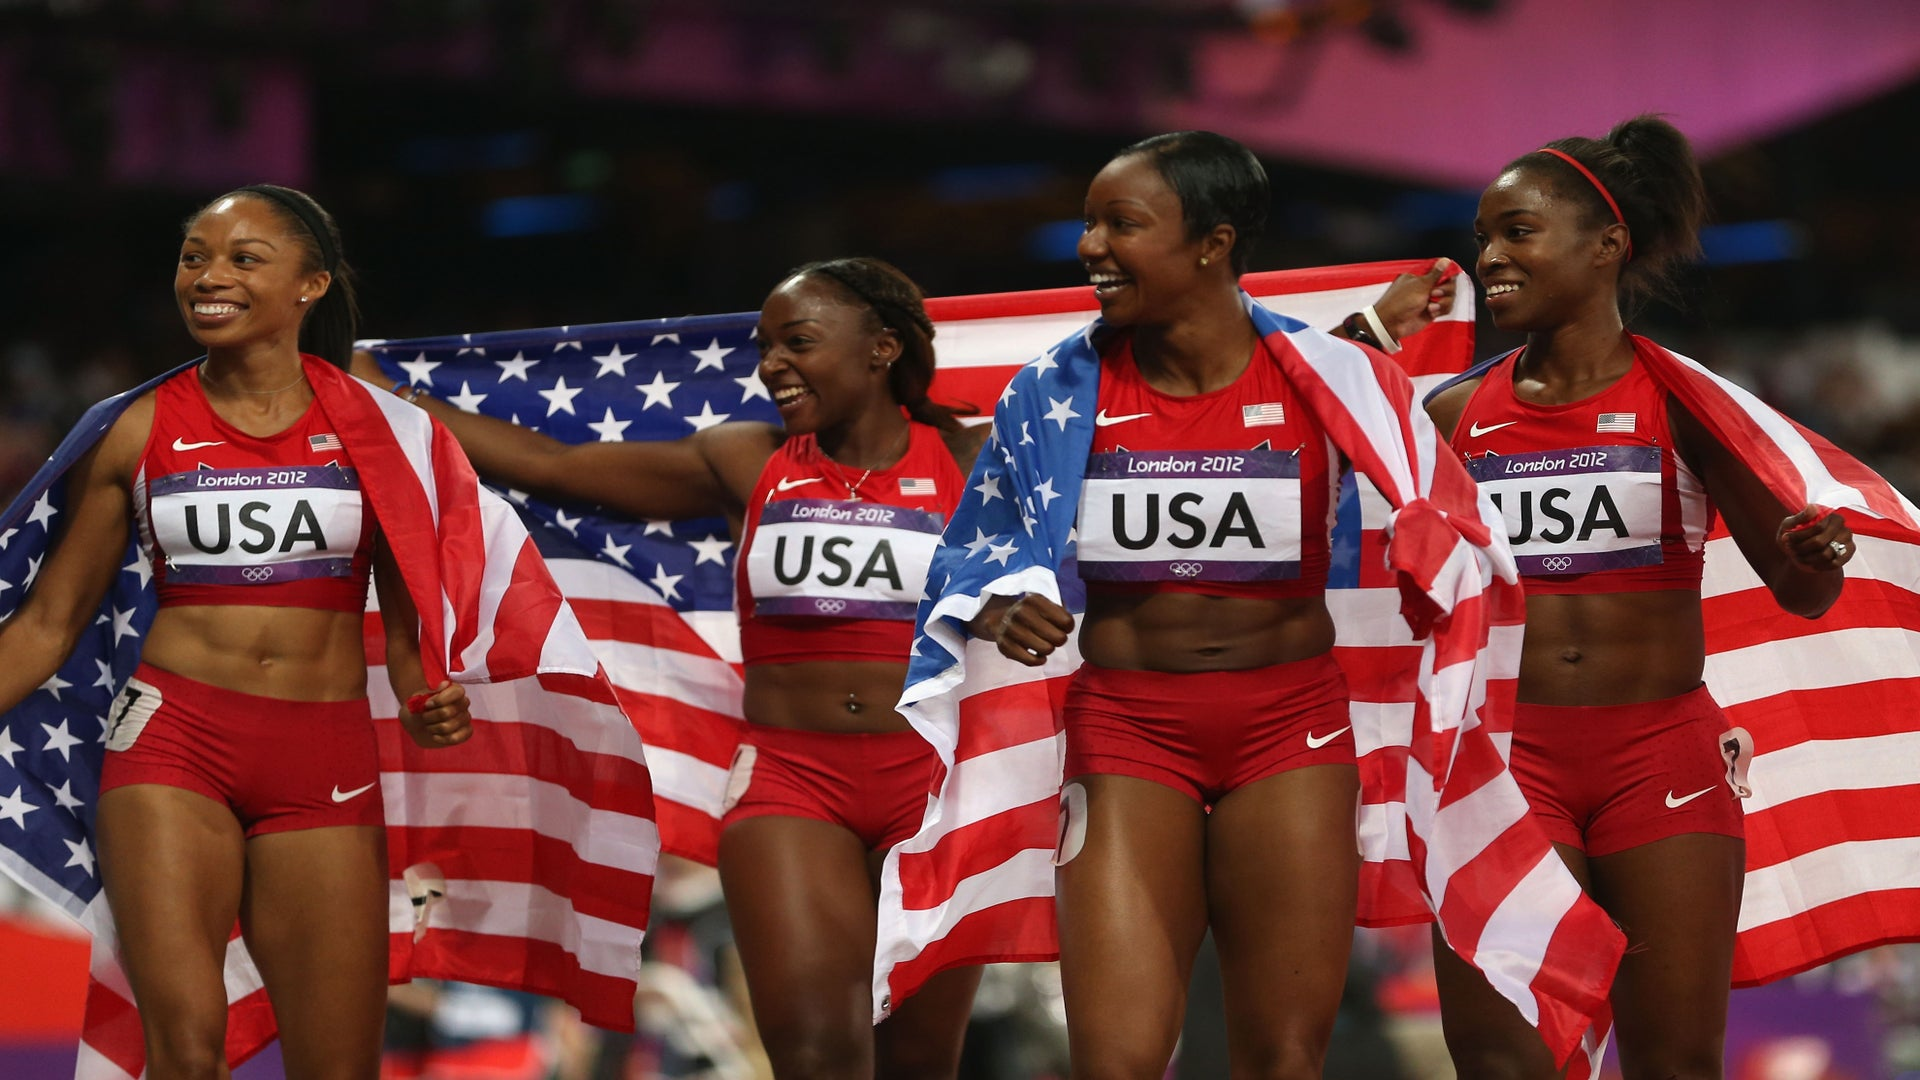 U.S. Women's 4×100 Relay Team Wins Gold, Breaks World Record